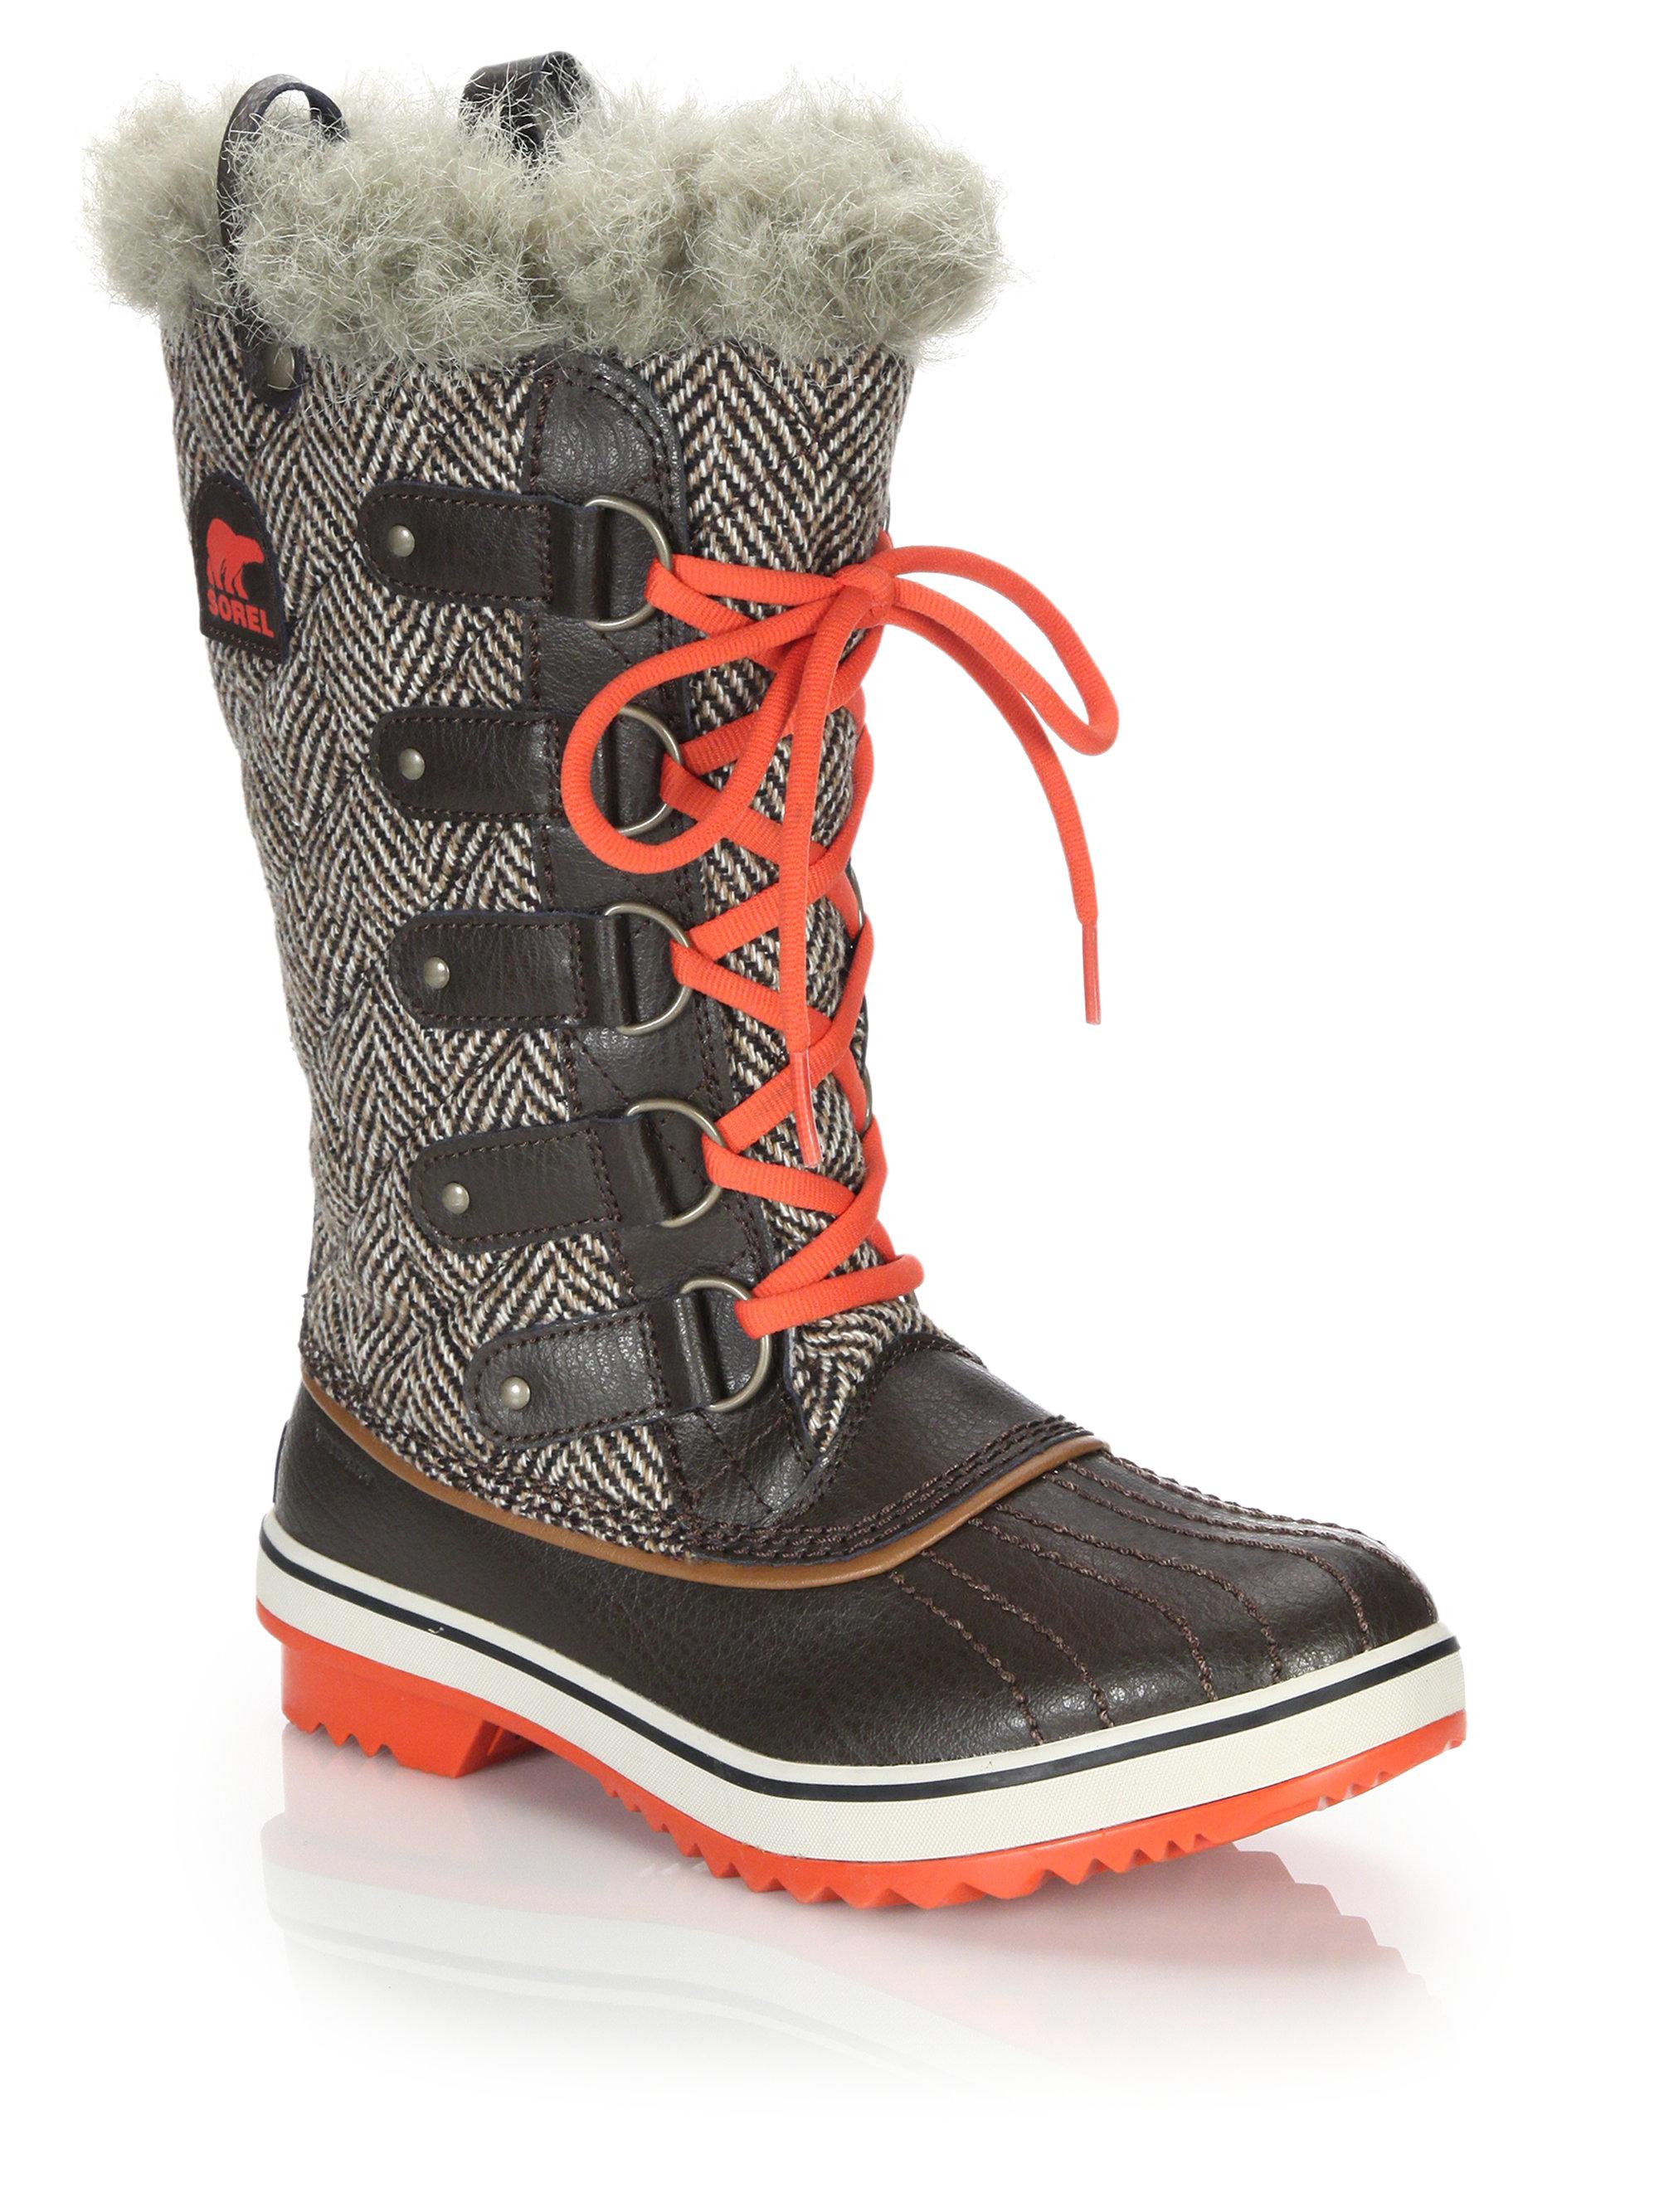 Lyst - Sorel Tofino Herringbone Water-Resistant Boots in ...